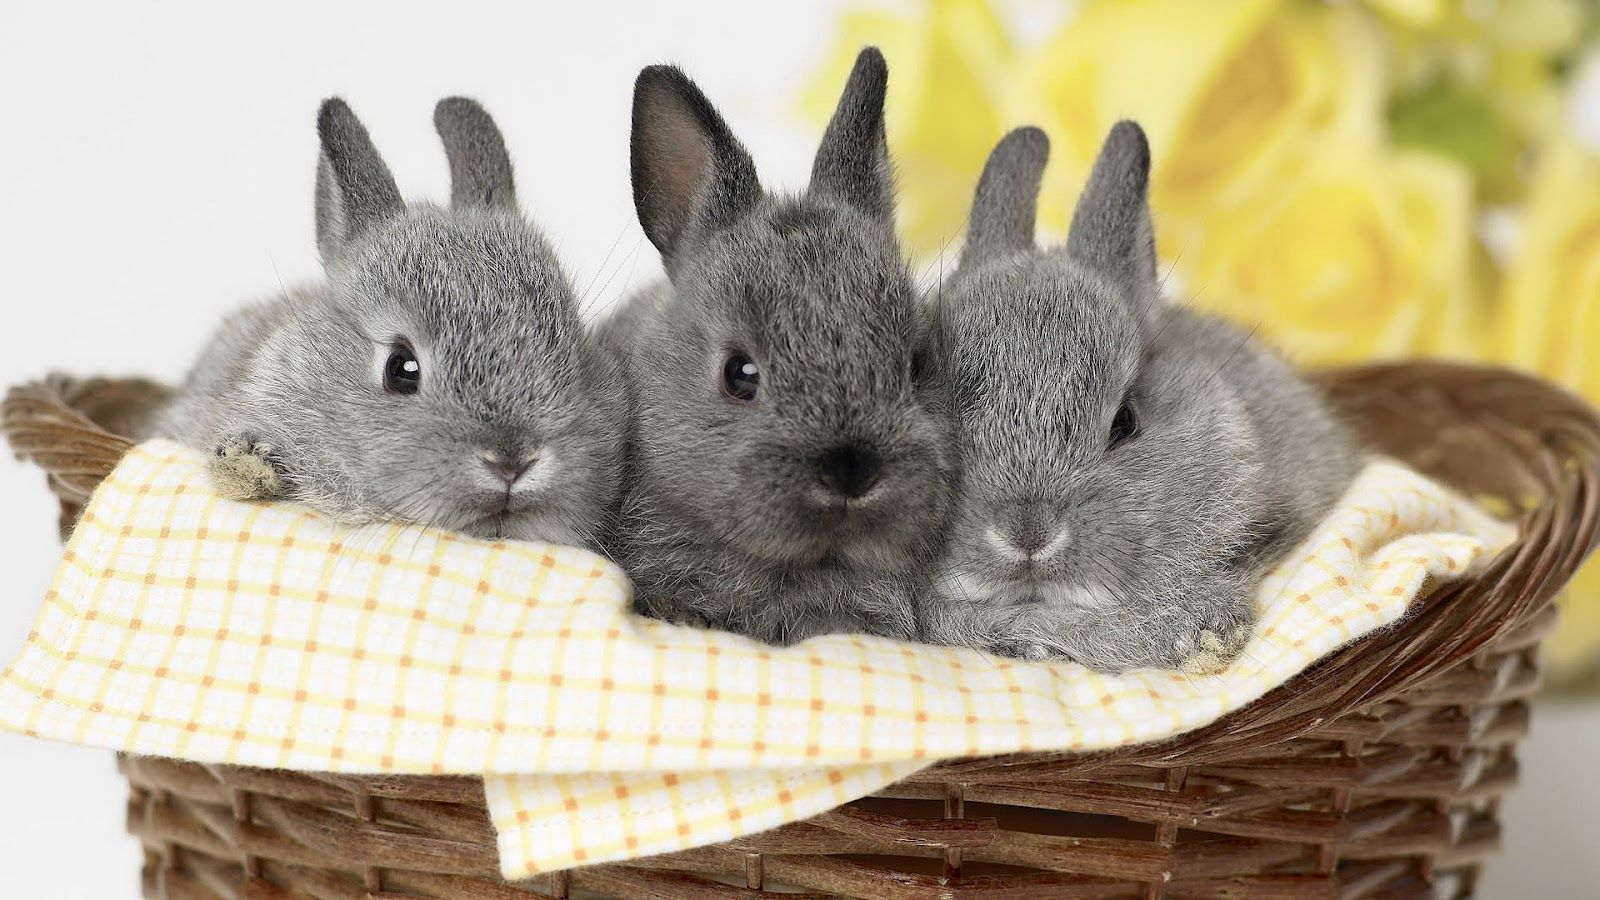 super schattige konijntjes :D